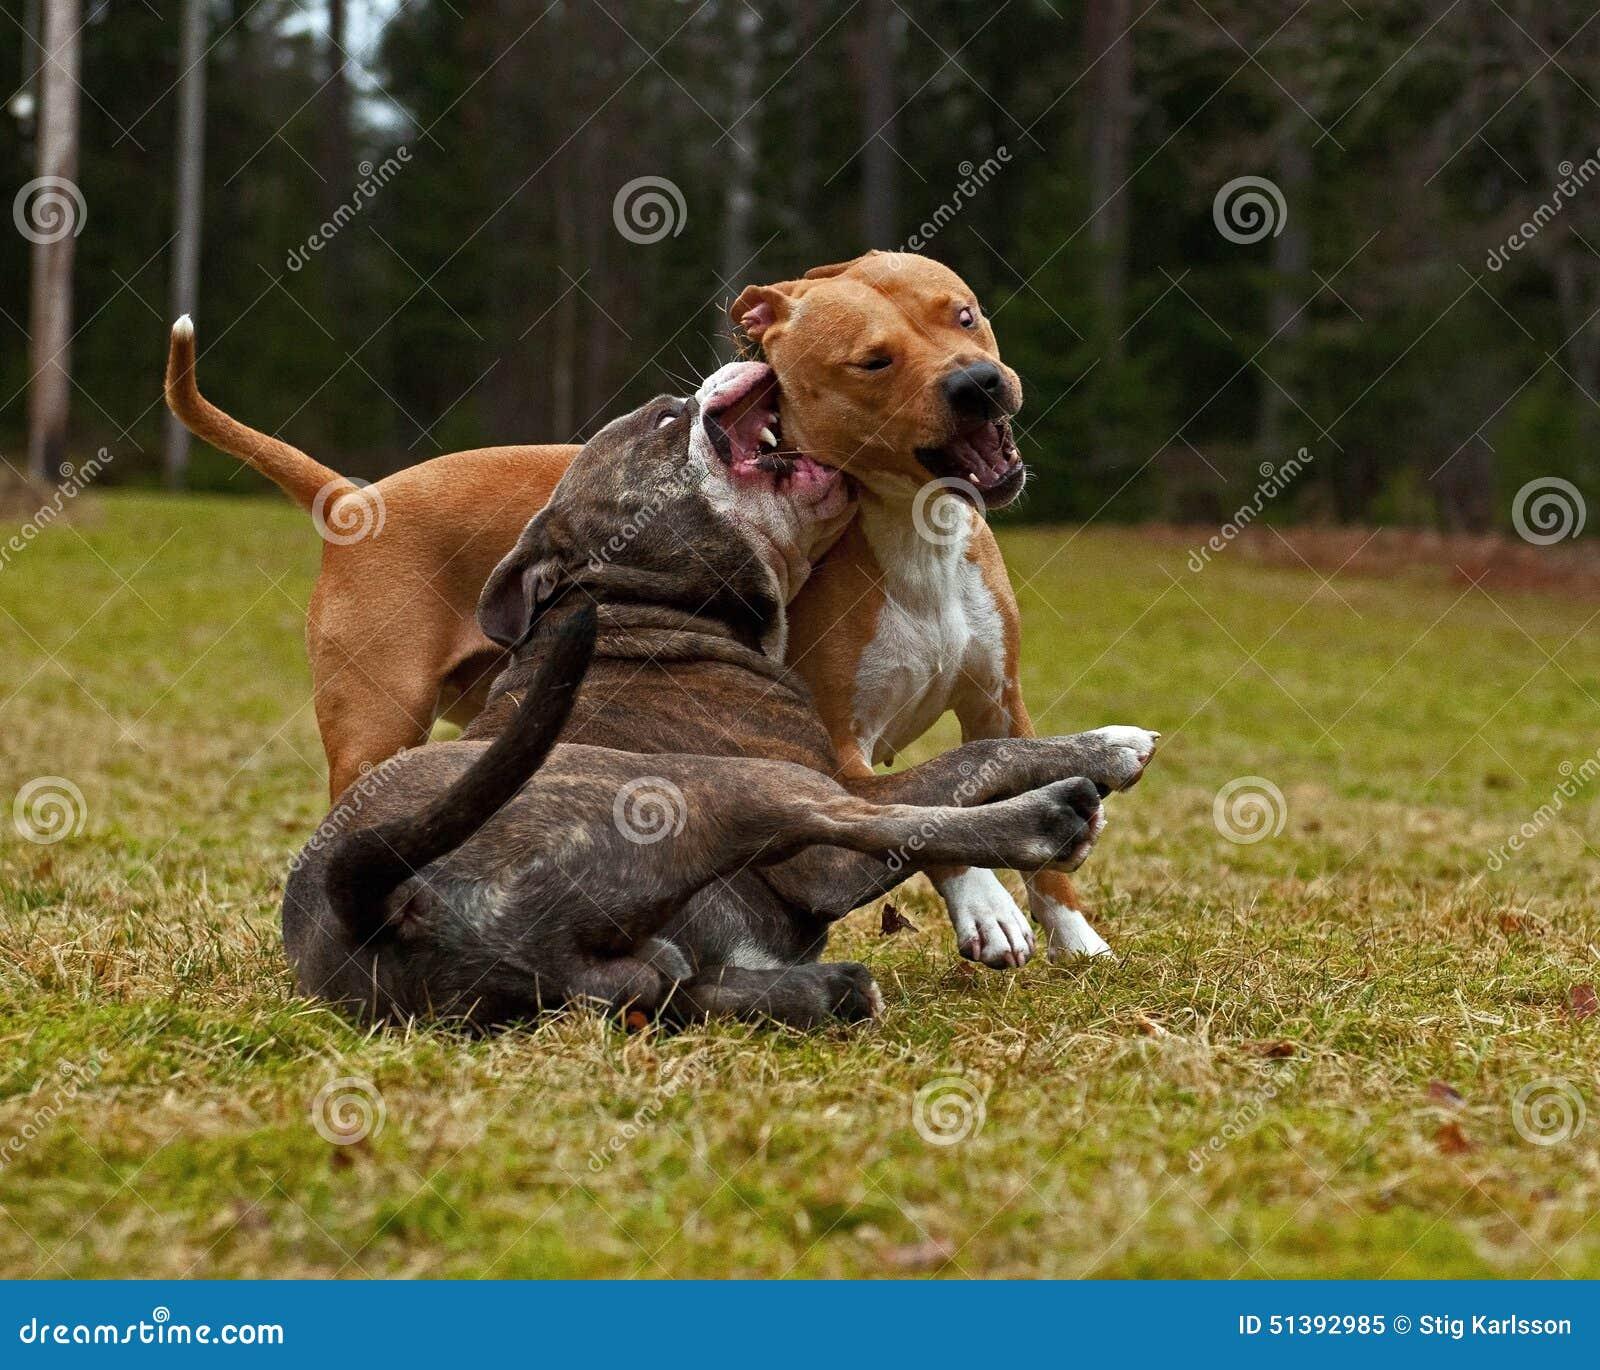 Pitbull Dog Fight Video Download